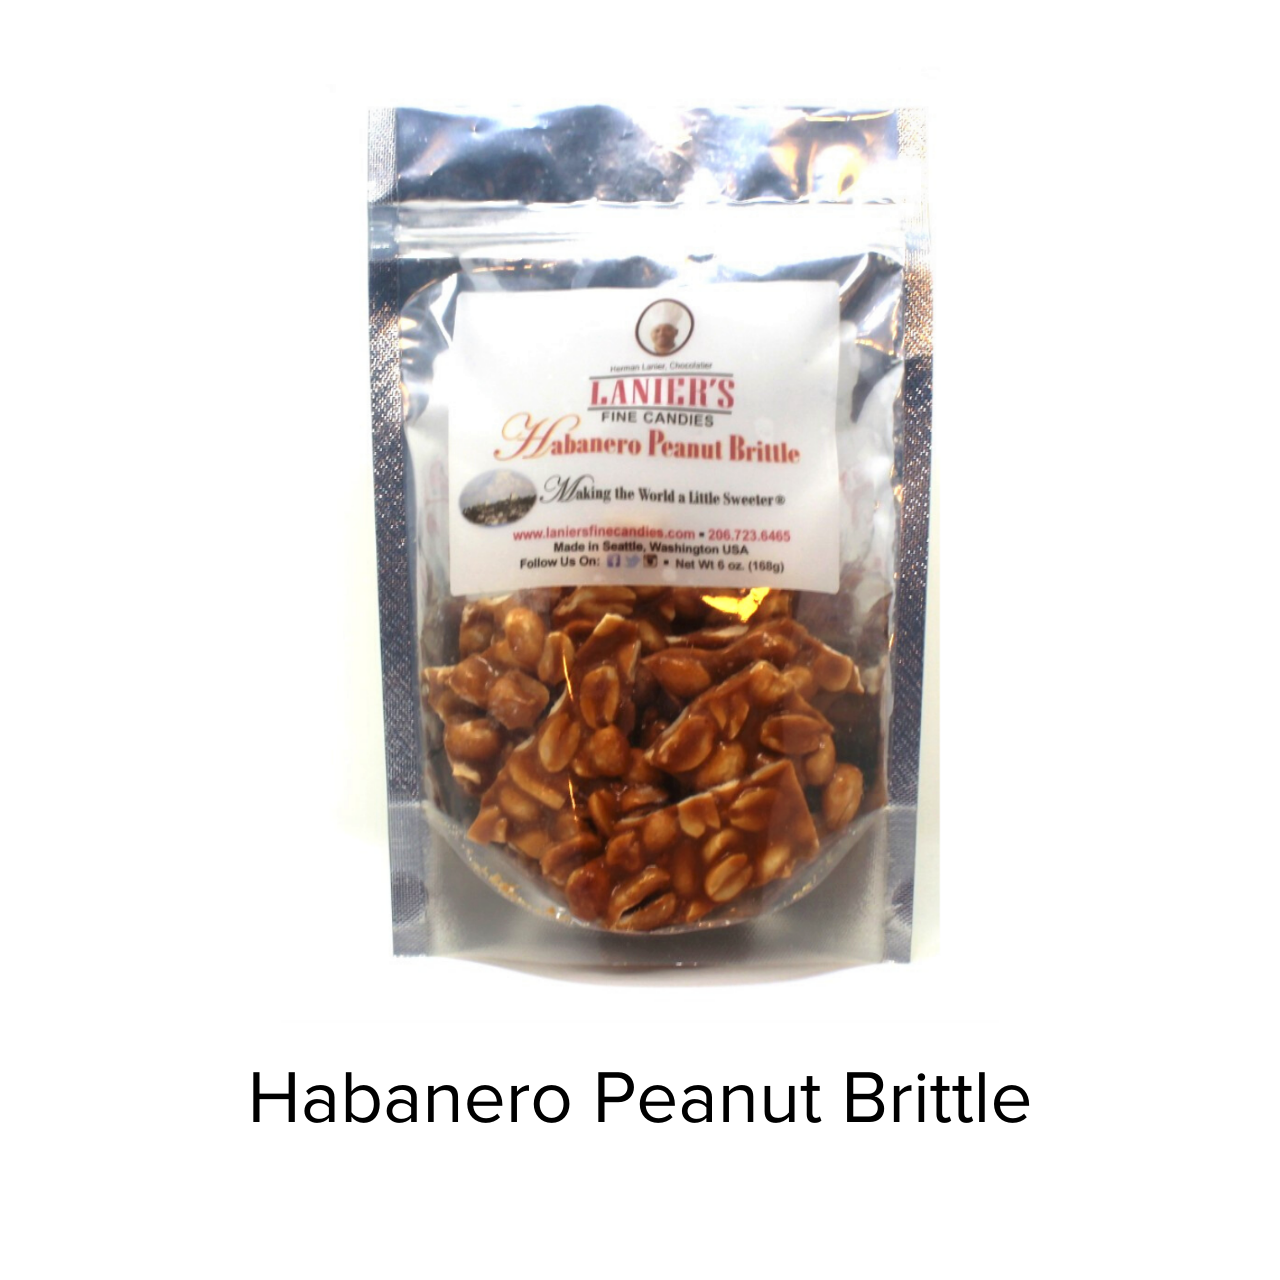 Laniers Brittle Habanero Peanut